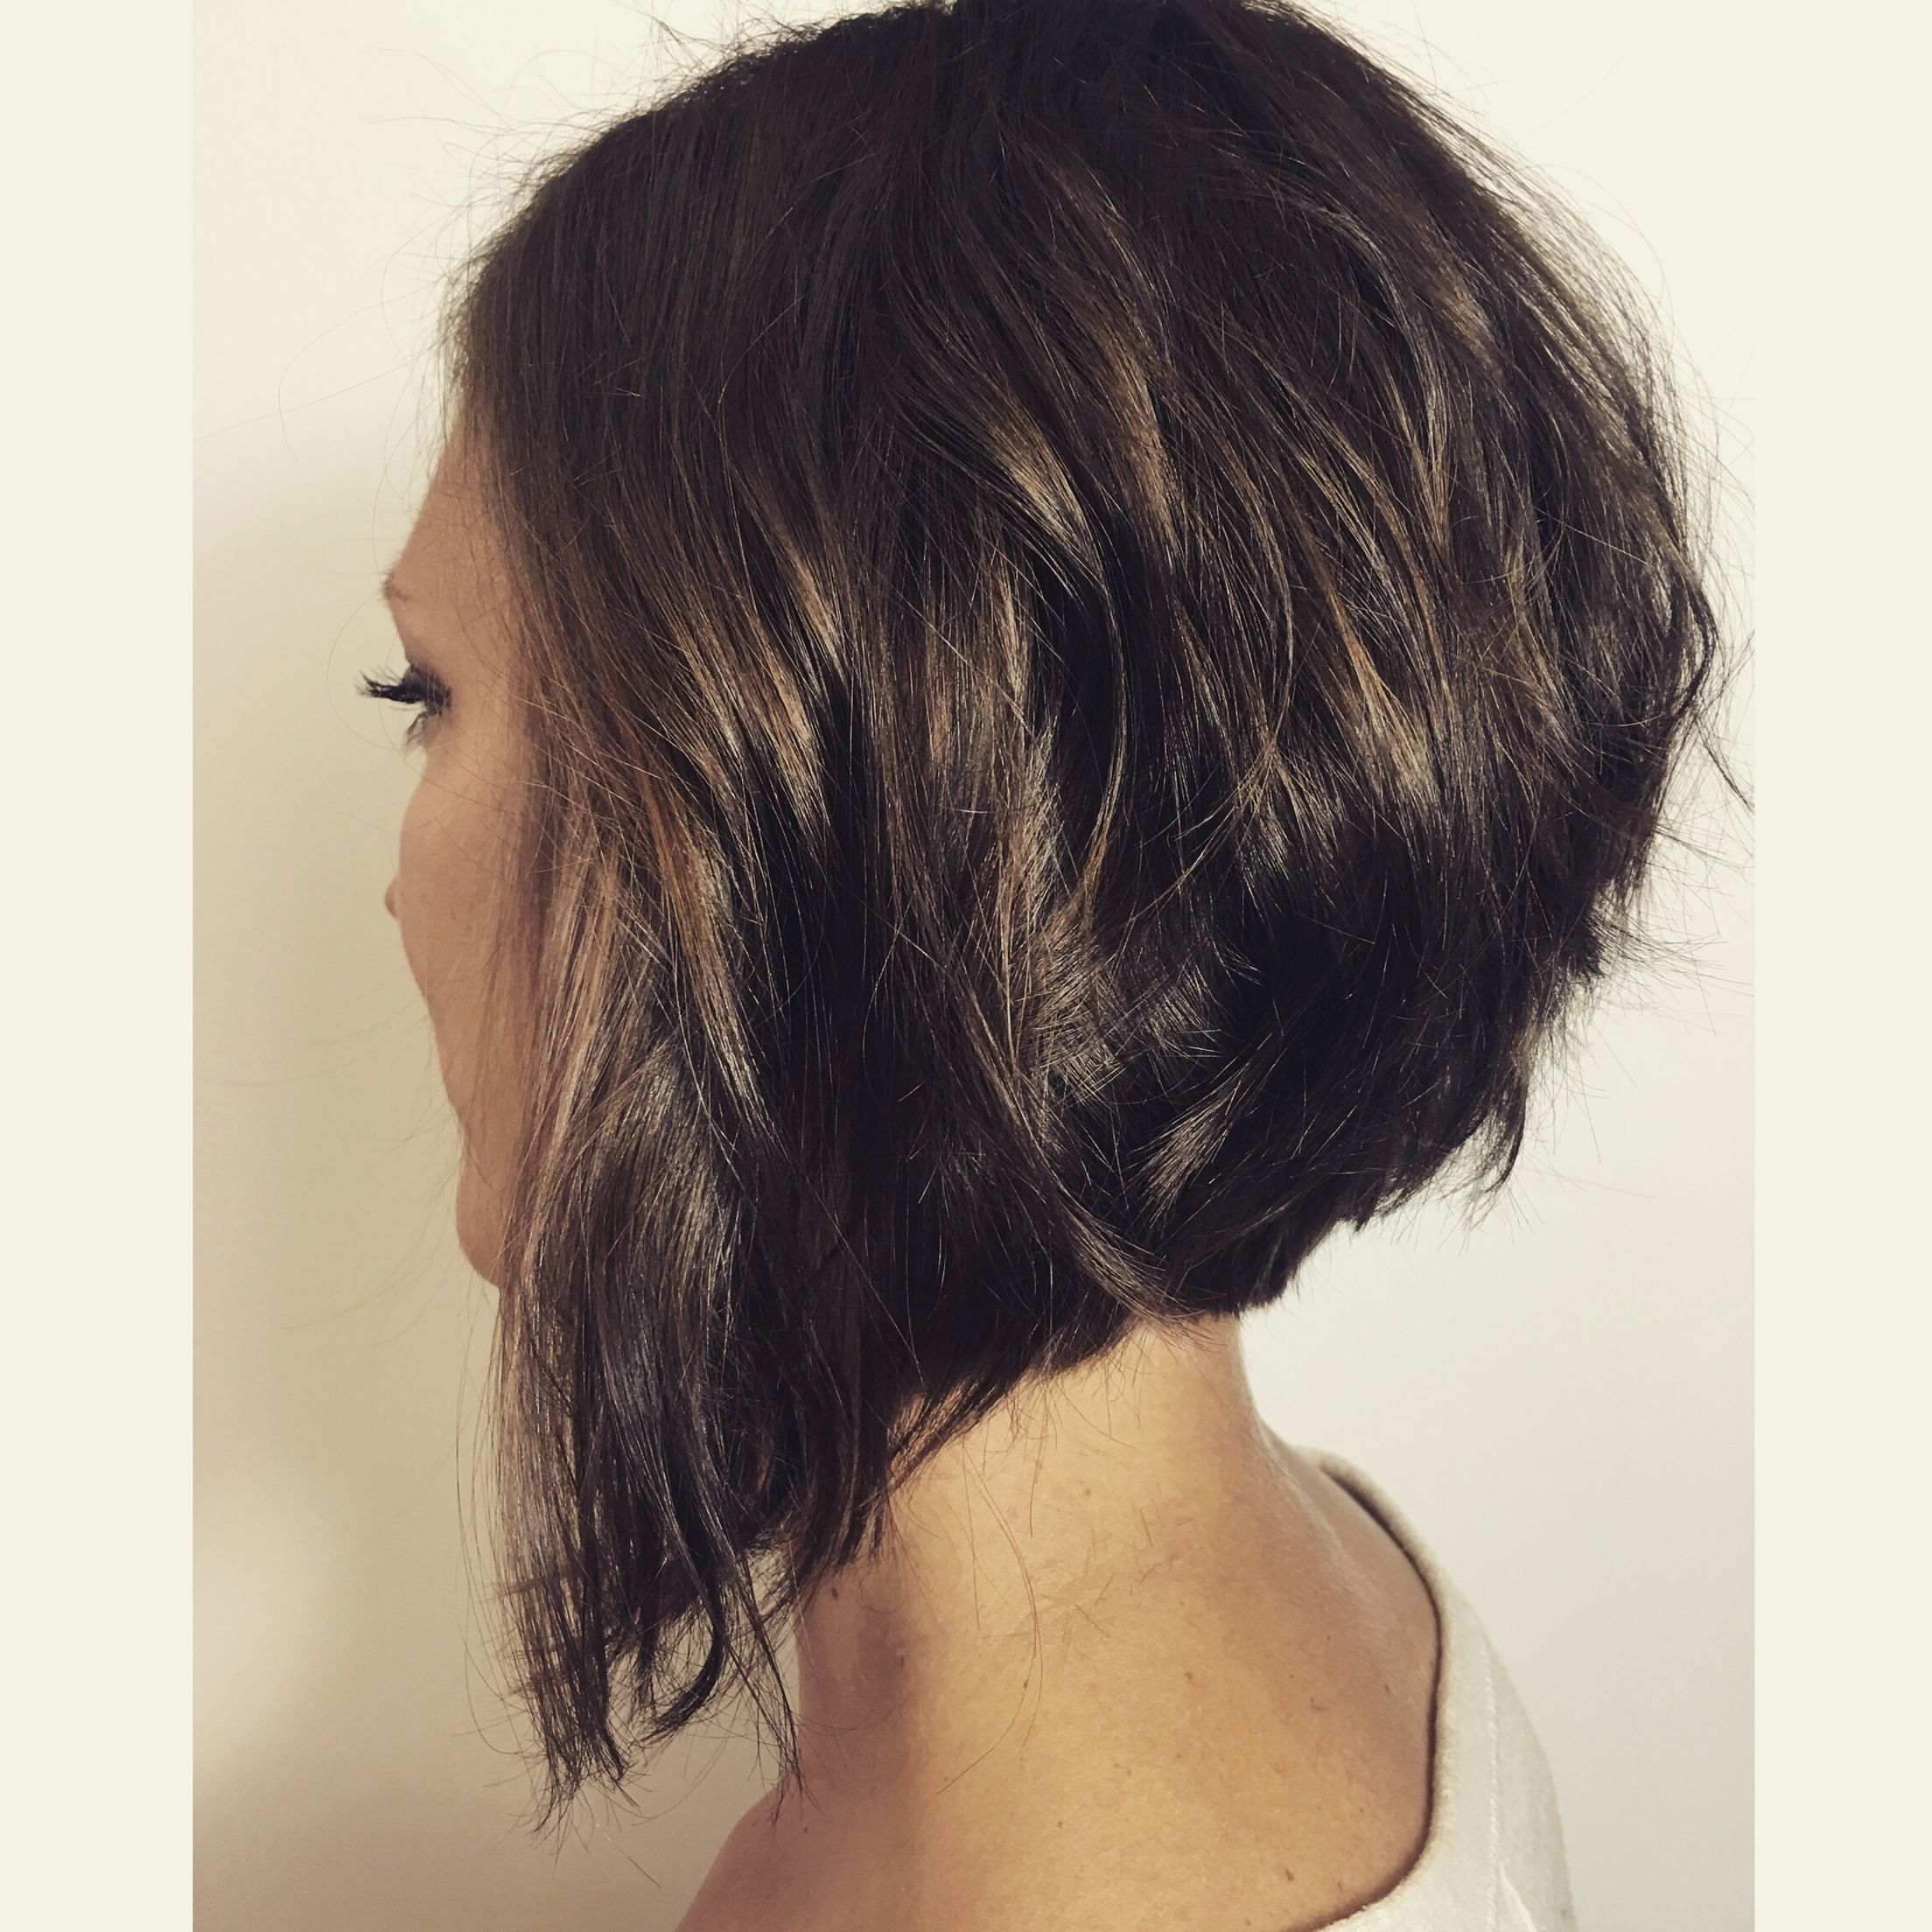 Angledbob Pageboysalonathens Athenshairsalon Lacey Uga Hair